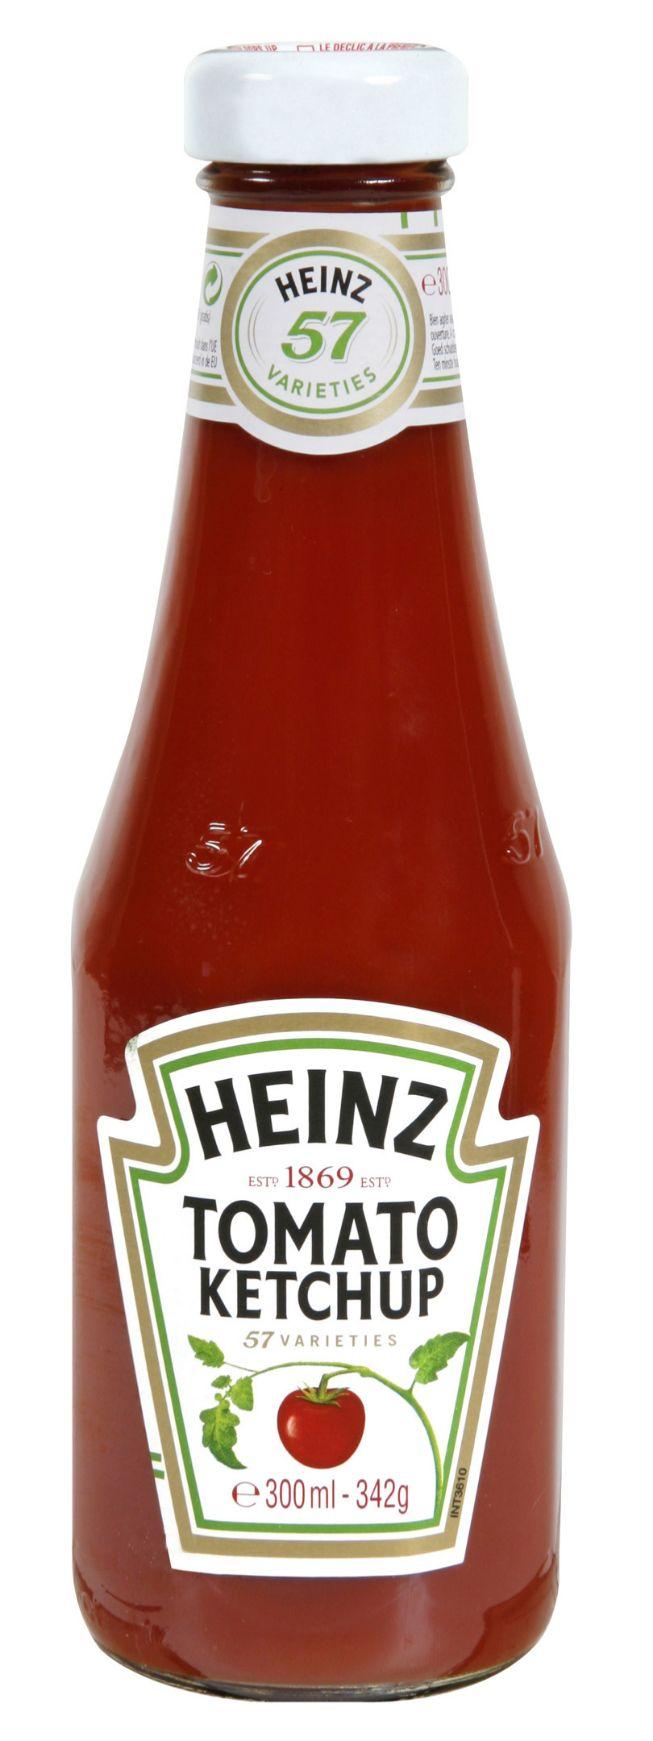 Heinz Tomato Ketchup 342g Flacon Verre image